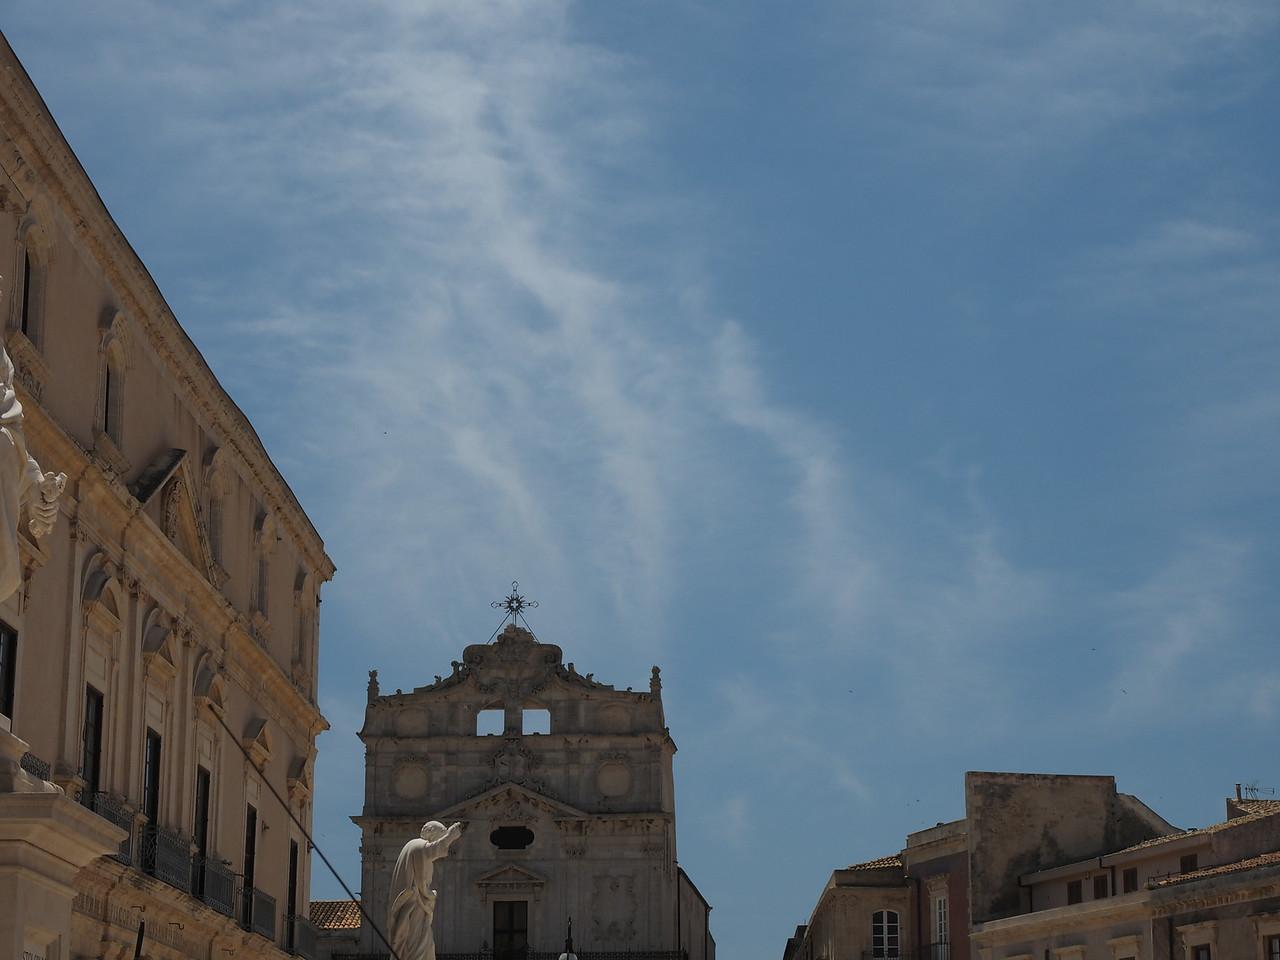 Duomo (cathedral) square, Ortigia